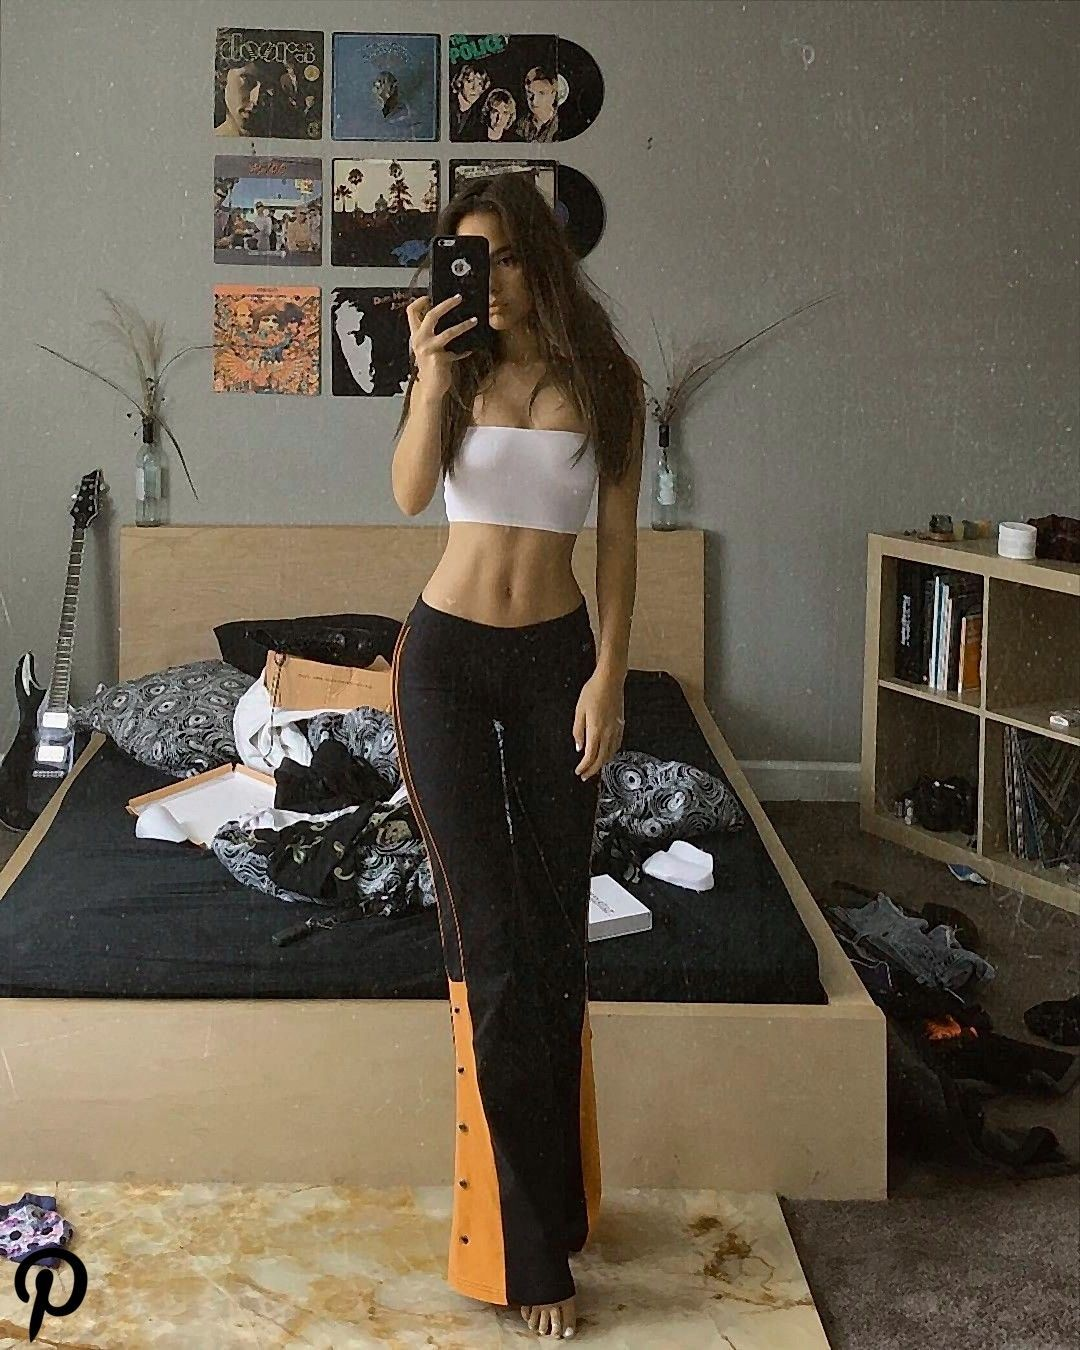 "Gefällt 20.3 Tsd. Mal, 39 Kommentare - fitness (@body_fitness_fashion) auf Instagram: ""Body Goals??#..."